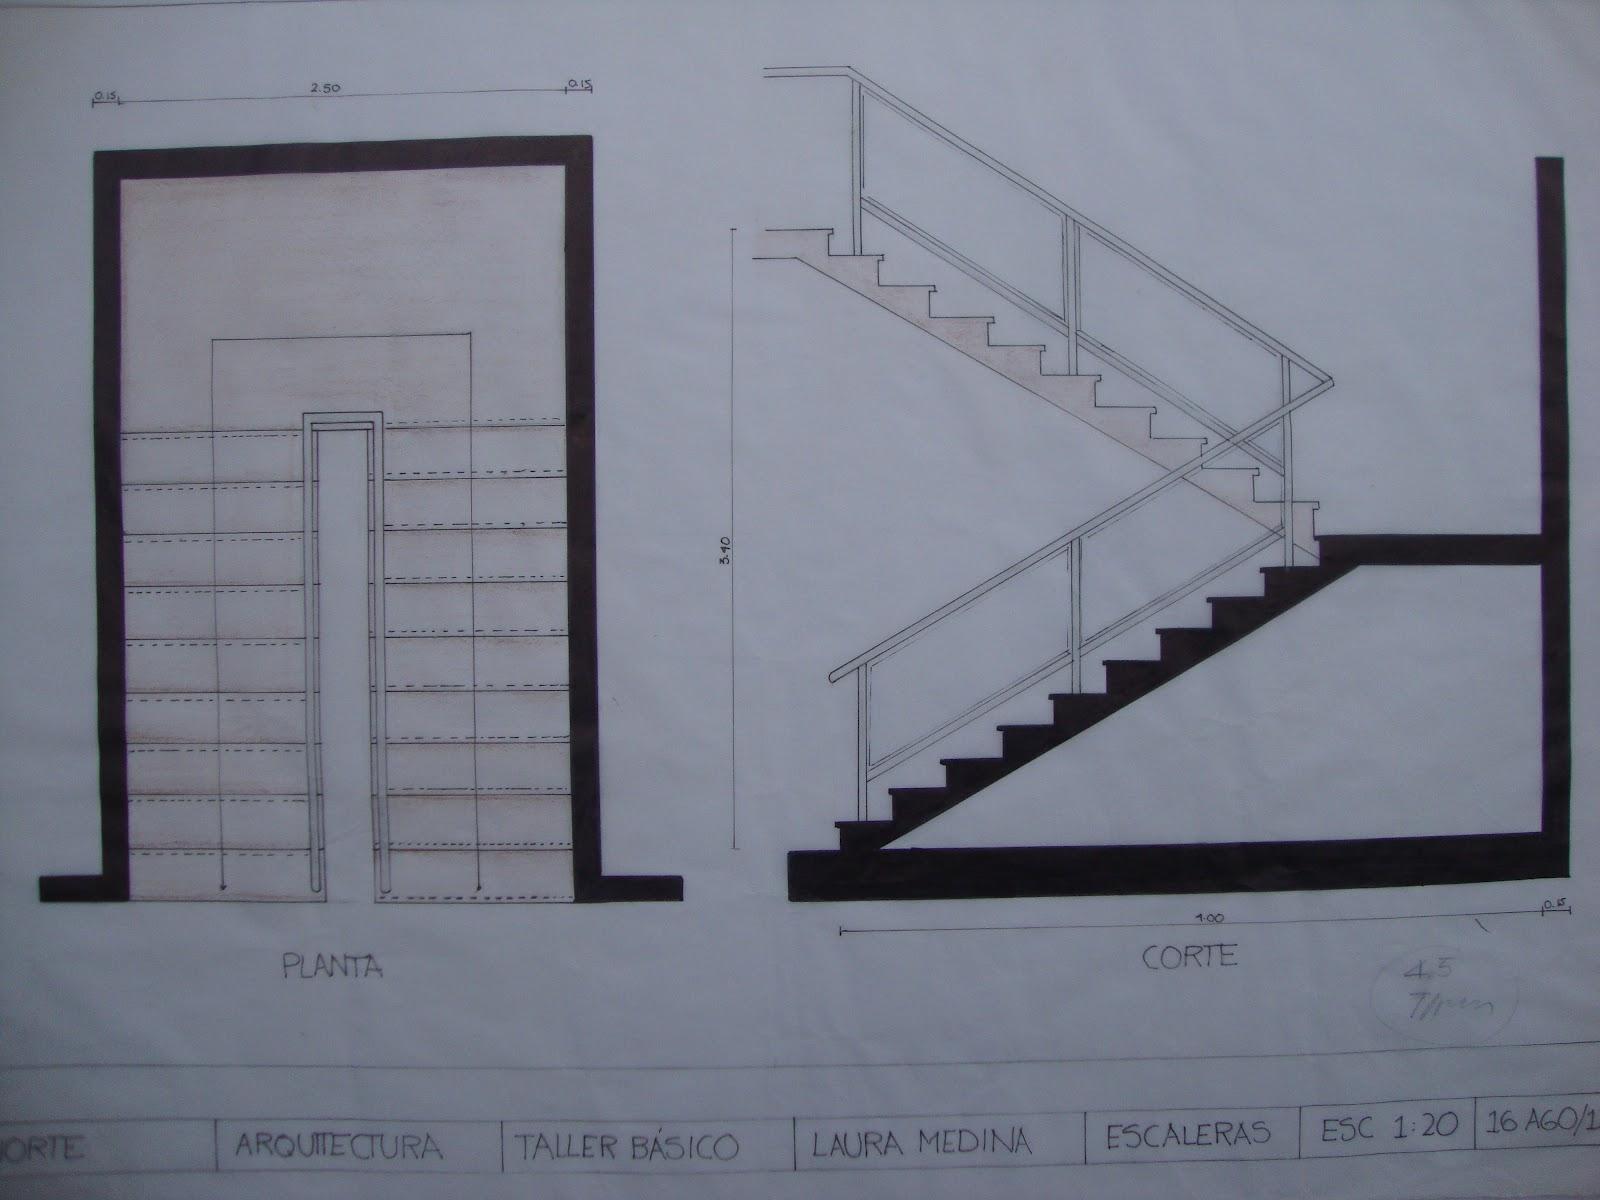 Taller basico arquitectura segundo semestre for Dimensiones de escaleras